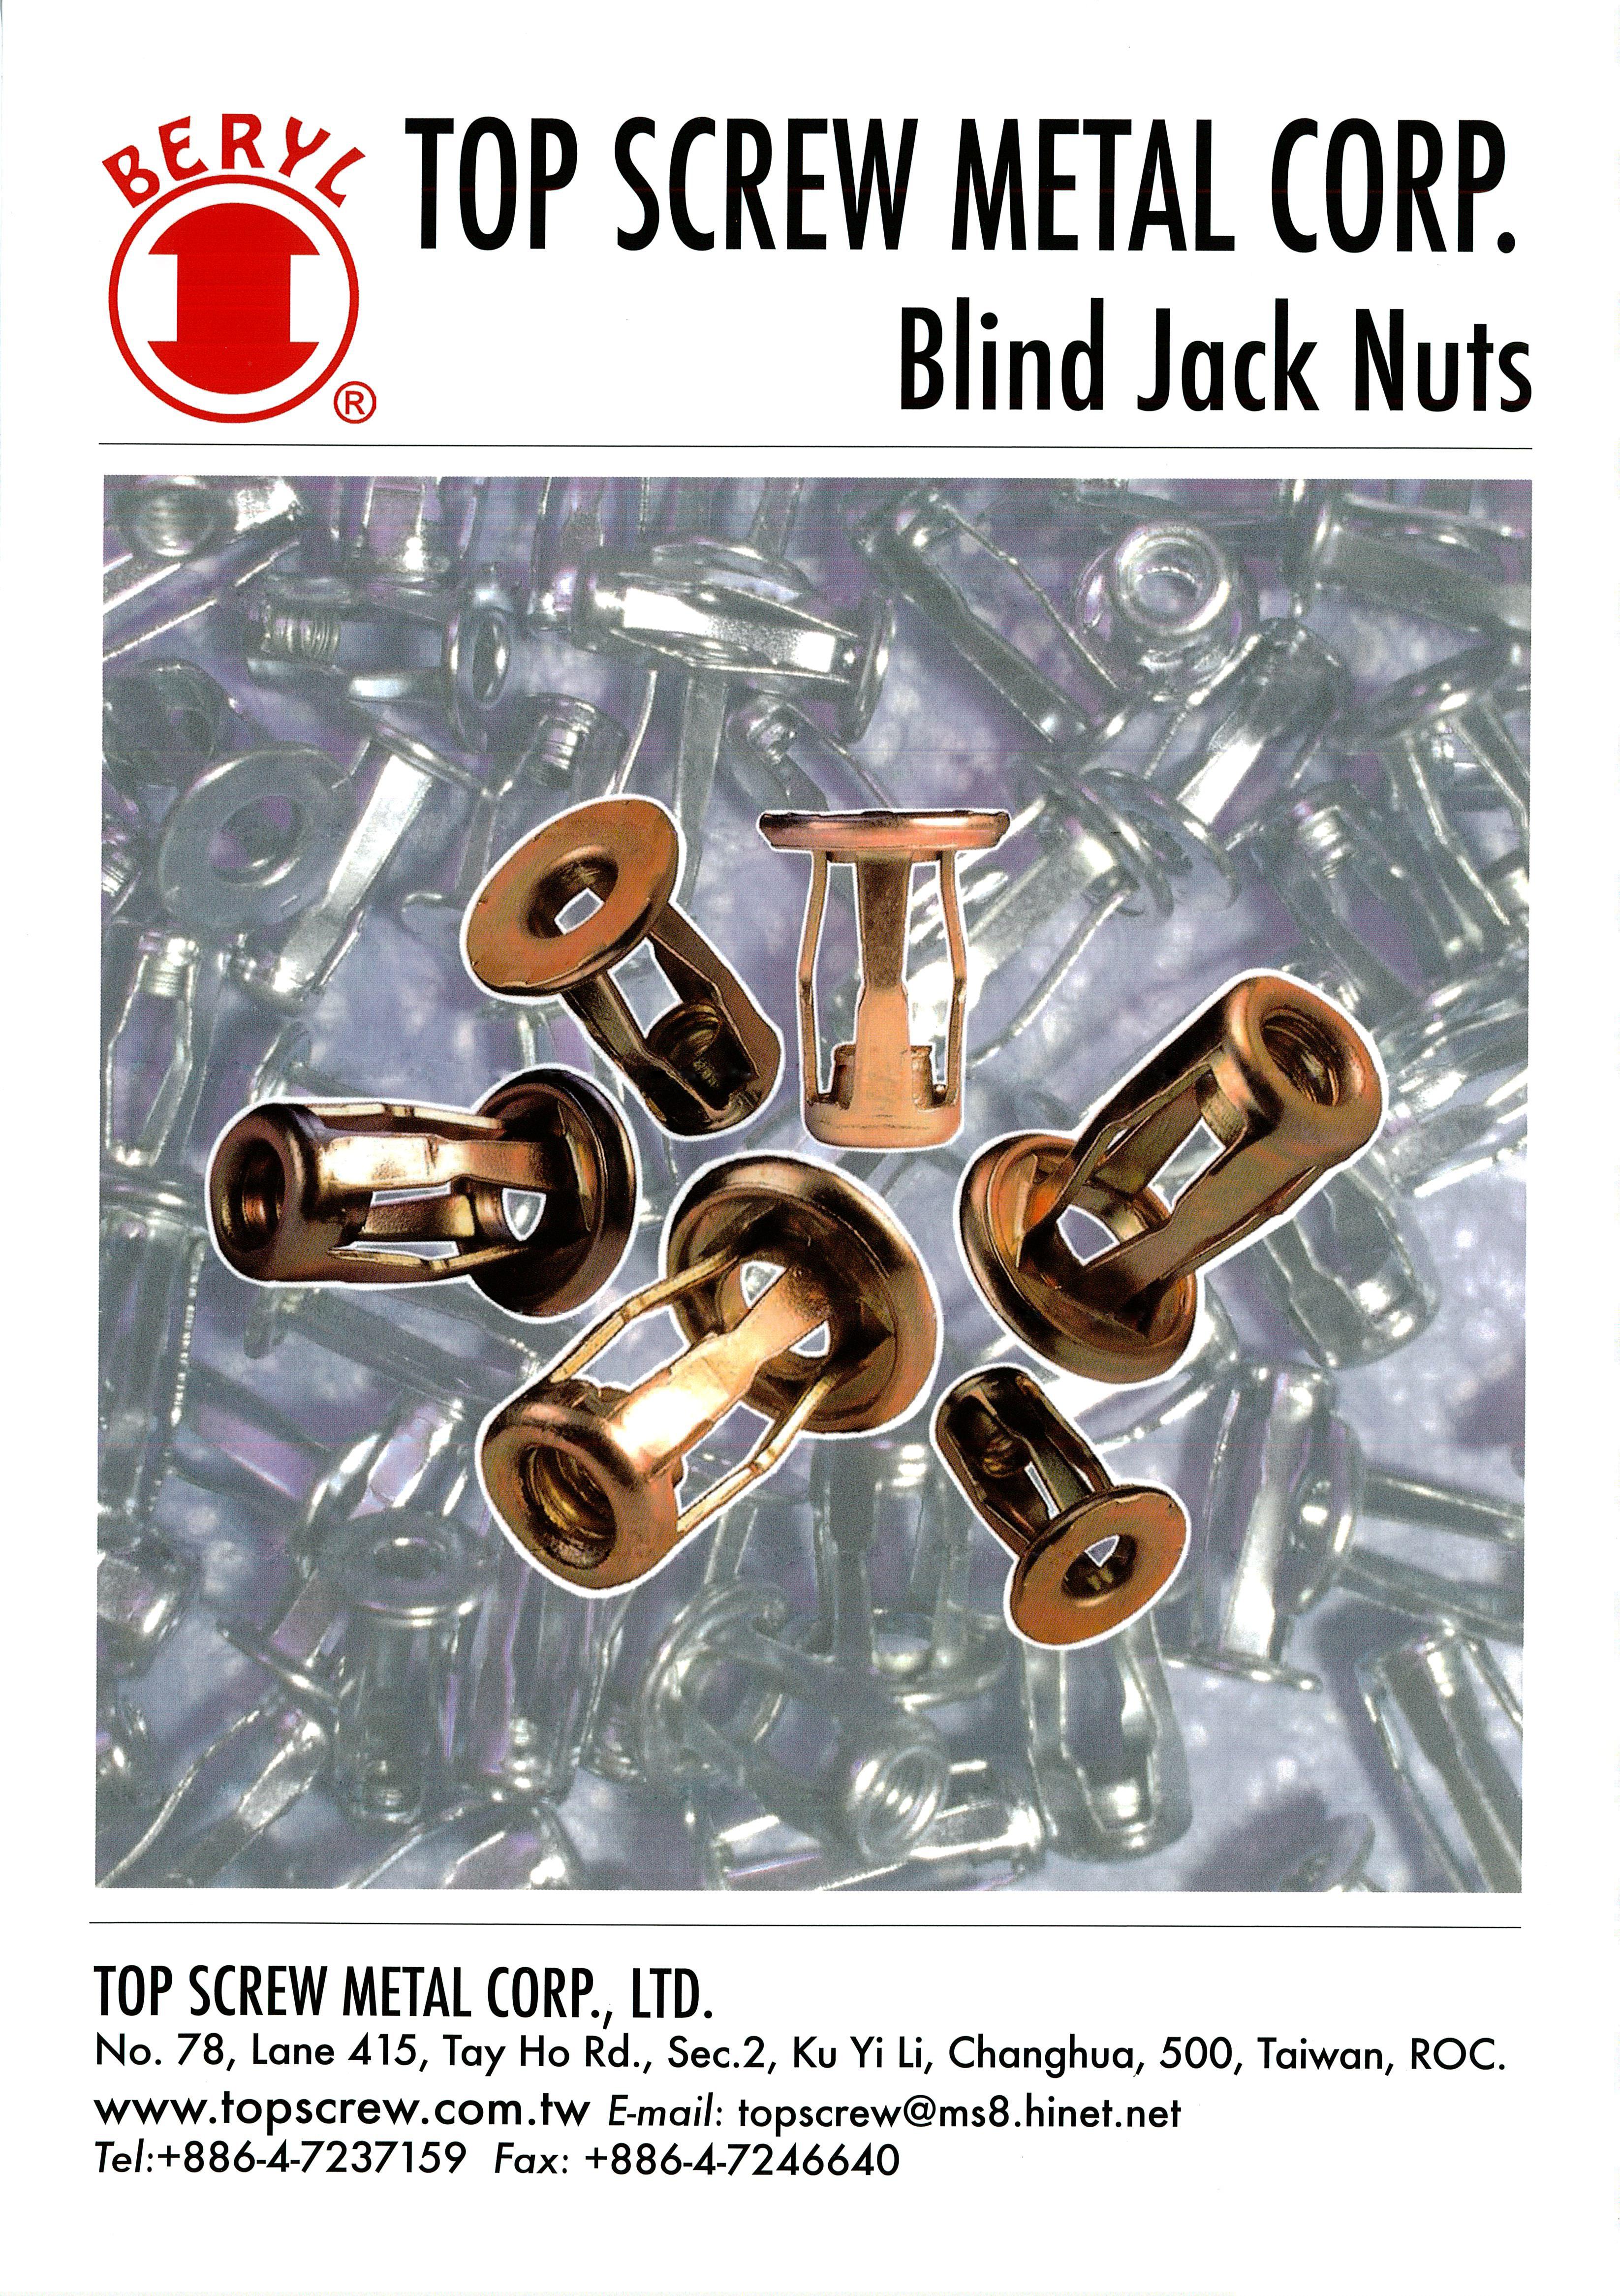 blind jack nut,jack nut,steel jack nut,stainless steel jack nut,steel blind jack nut,stainless blind jack nut,fasteners,metal forging,jack nut manufactory,manufacture